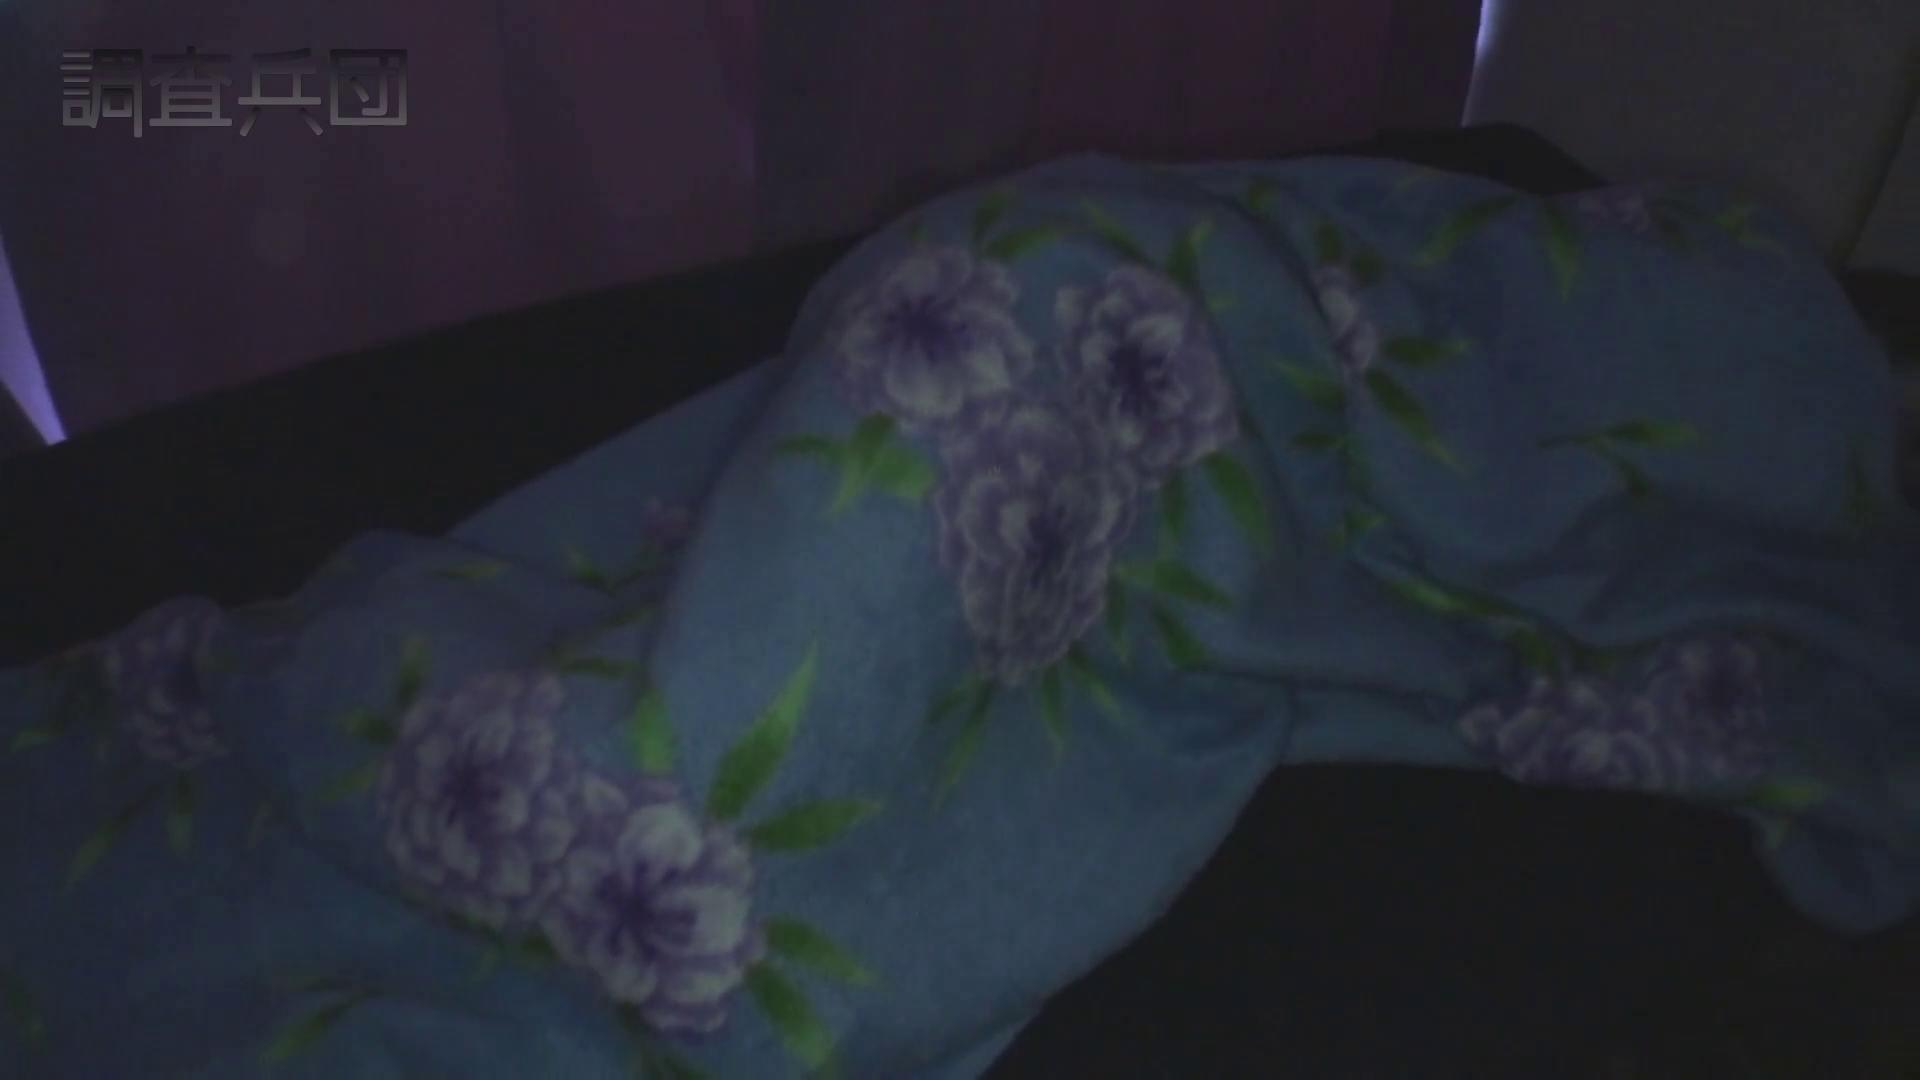 RE:~反撃の悪戯~vol.7 パンケーキ屋バイト・あかり【前編】 高画質 われめAV動画紹介 101枚 4